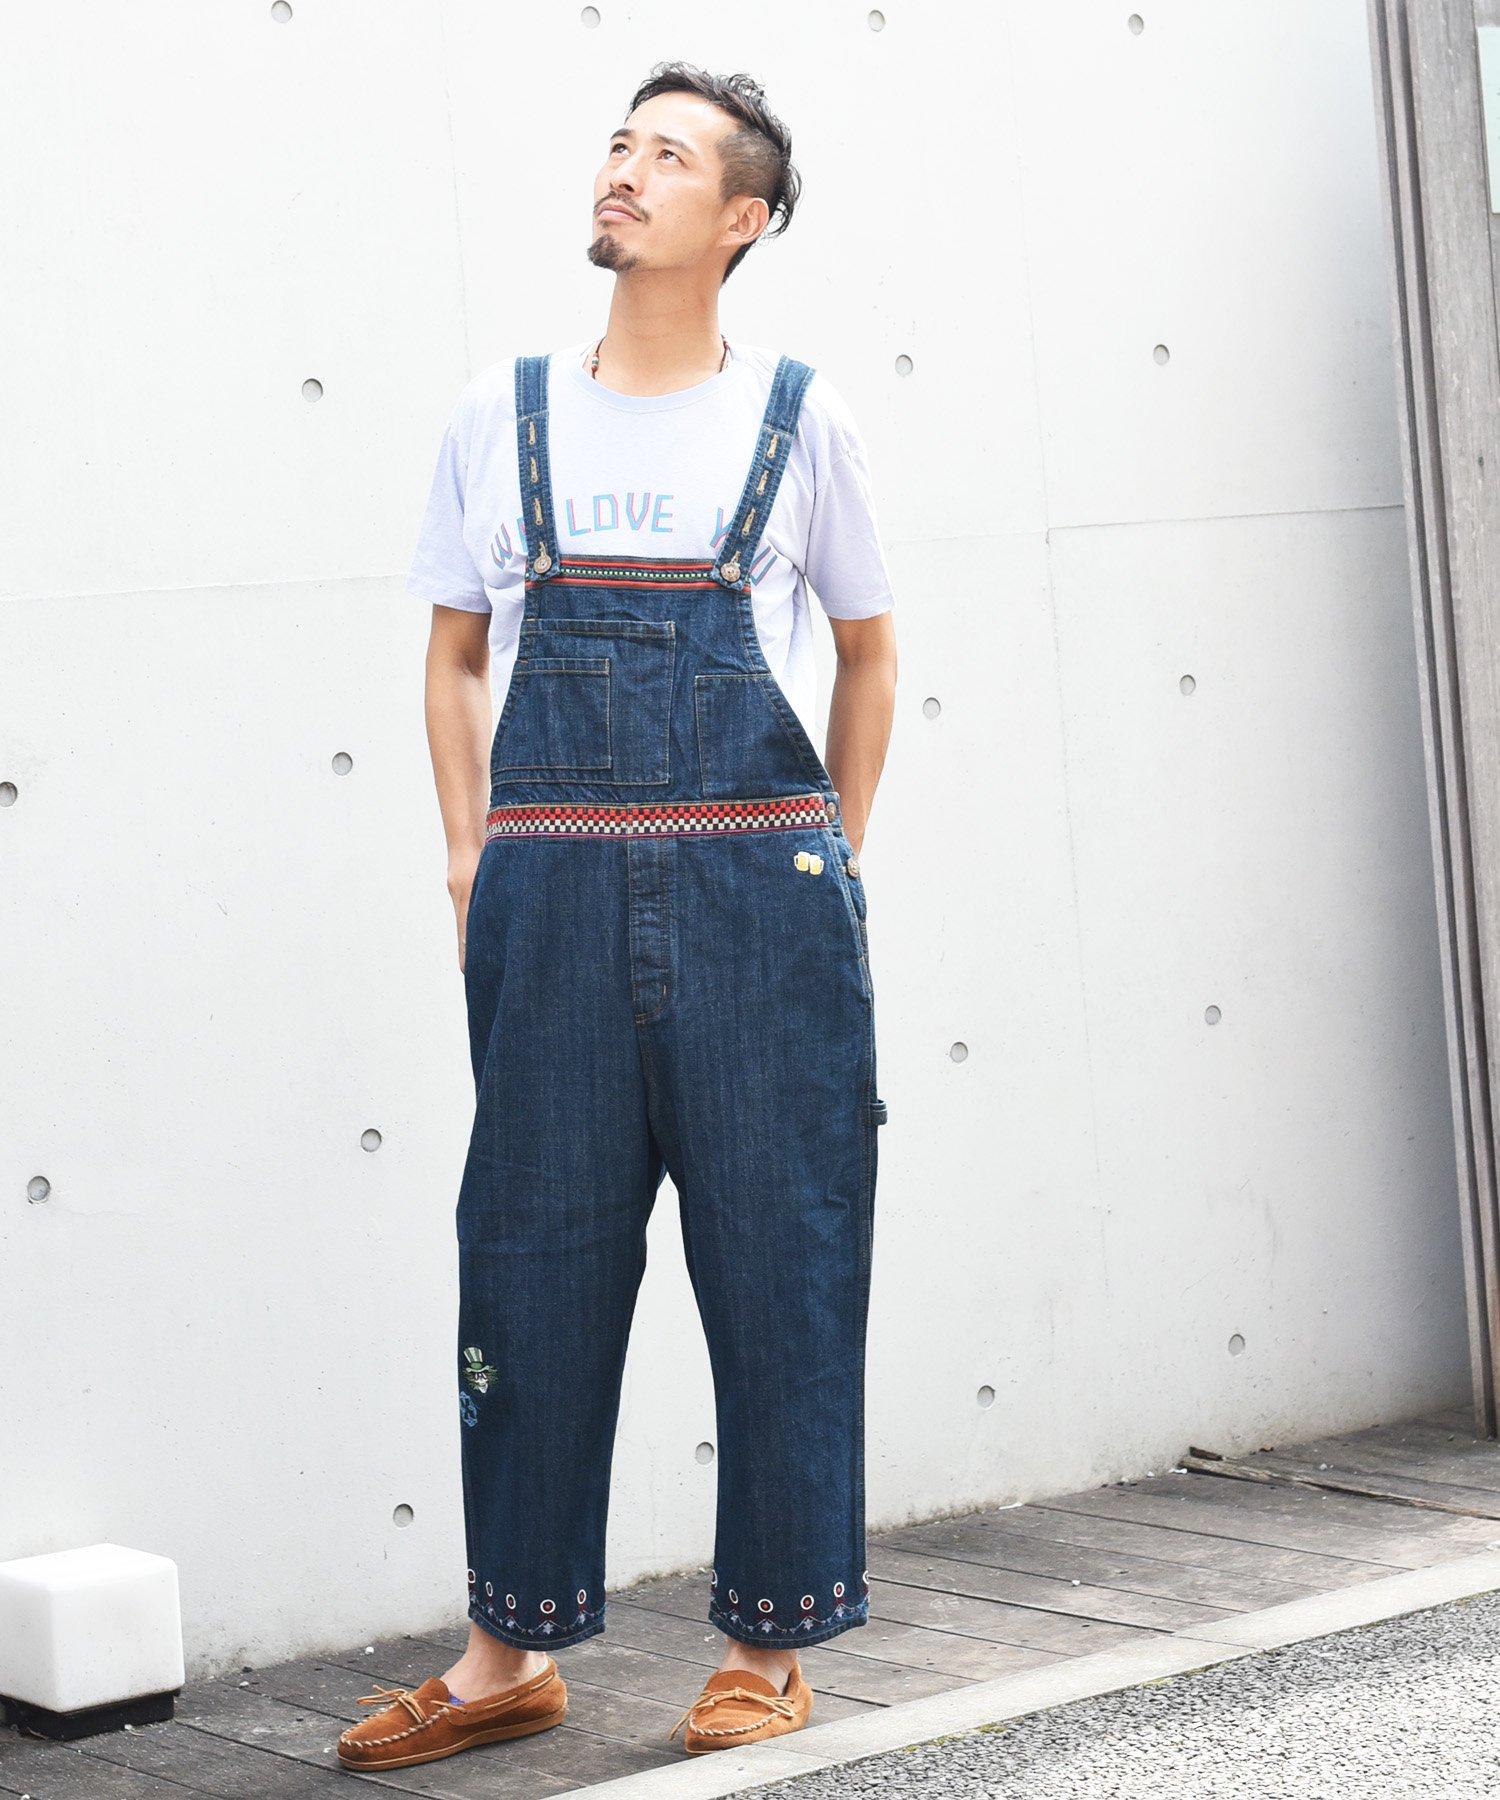 ARIGATO FAKKYU - アリガトファッキュ OVERALL / INDIGO